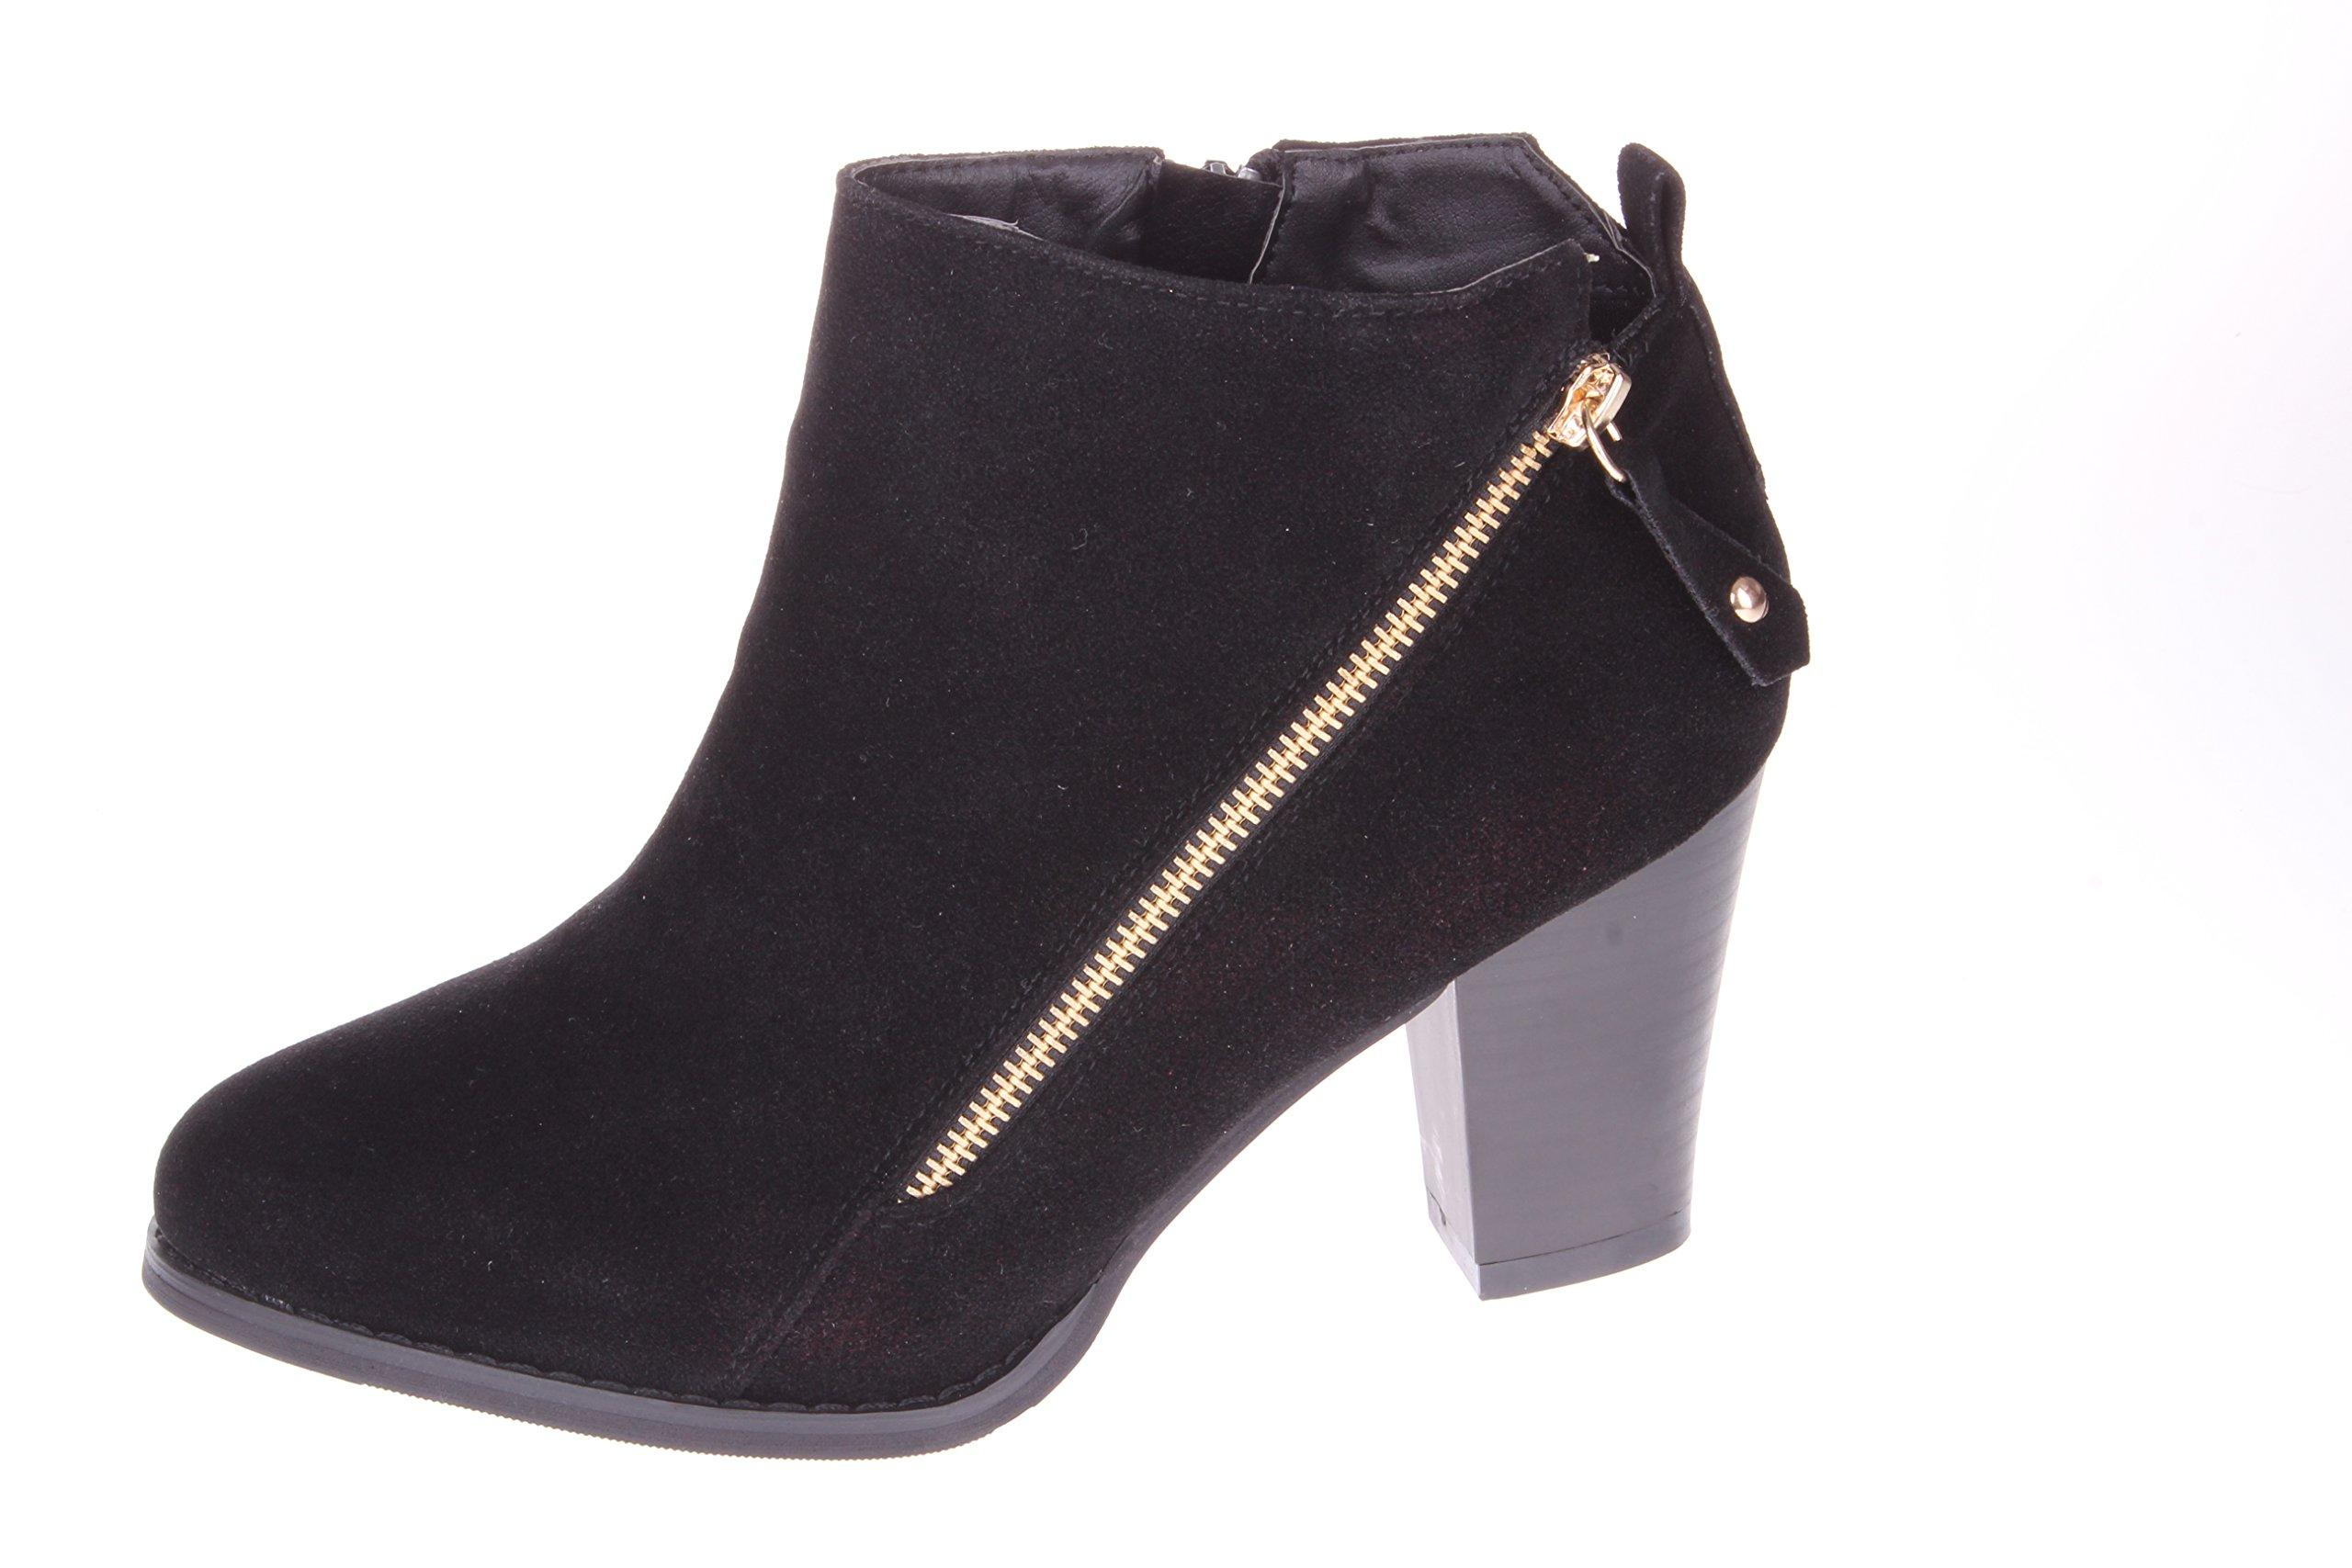 Enimay Women's 3 Inch Block Heel Pull On Ankle Booties Side Zip Up Closure Black 8